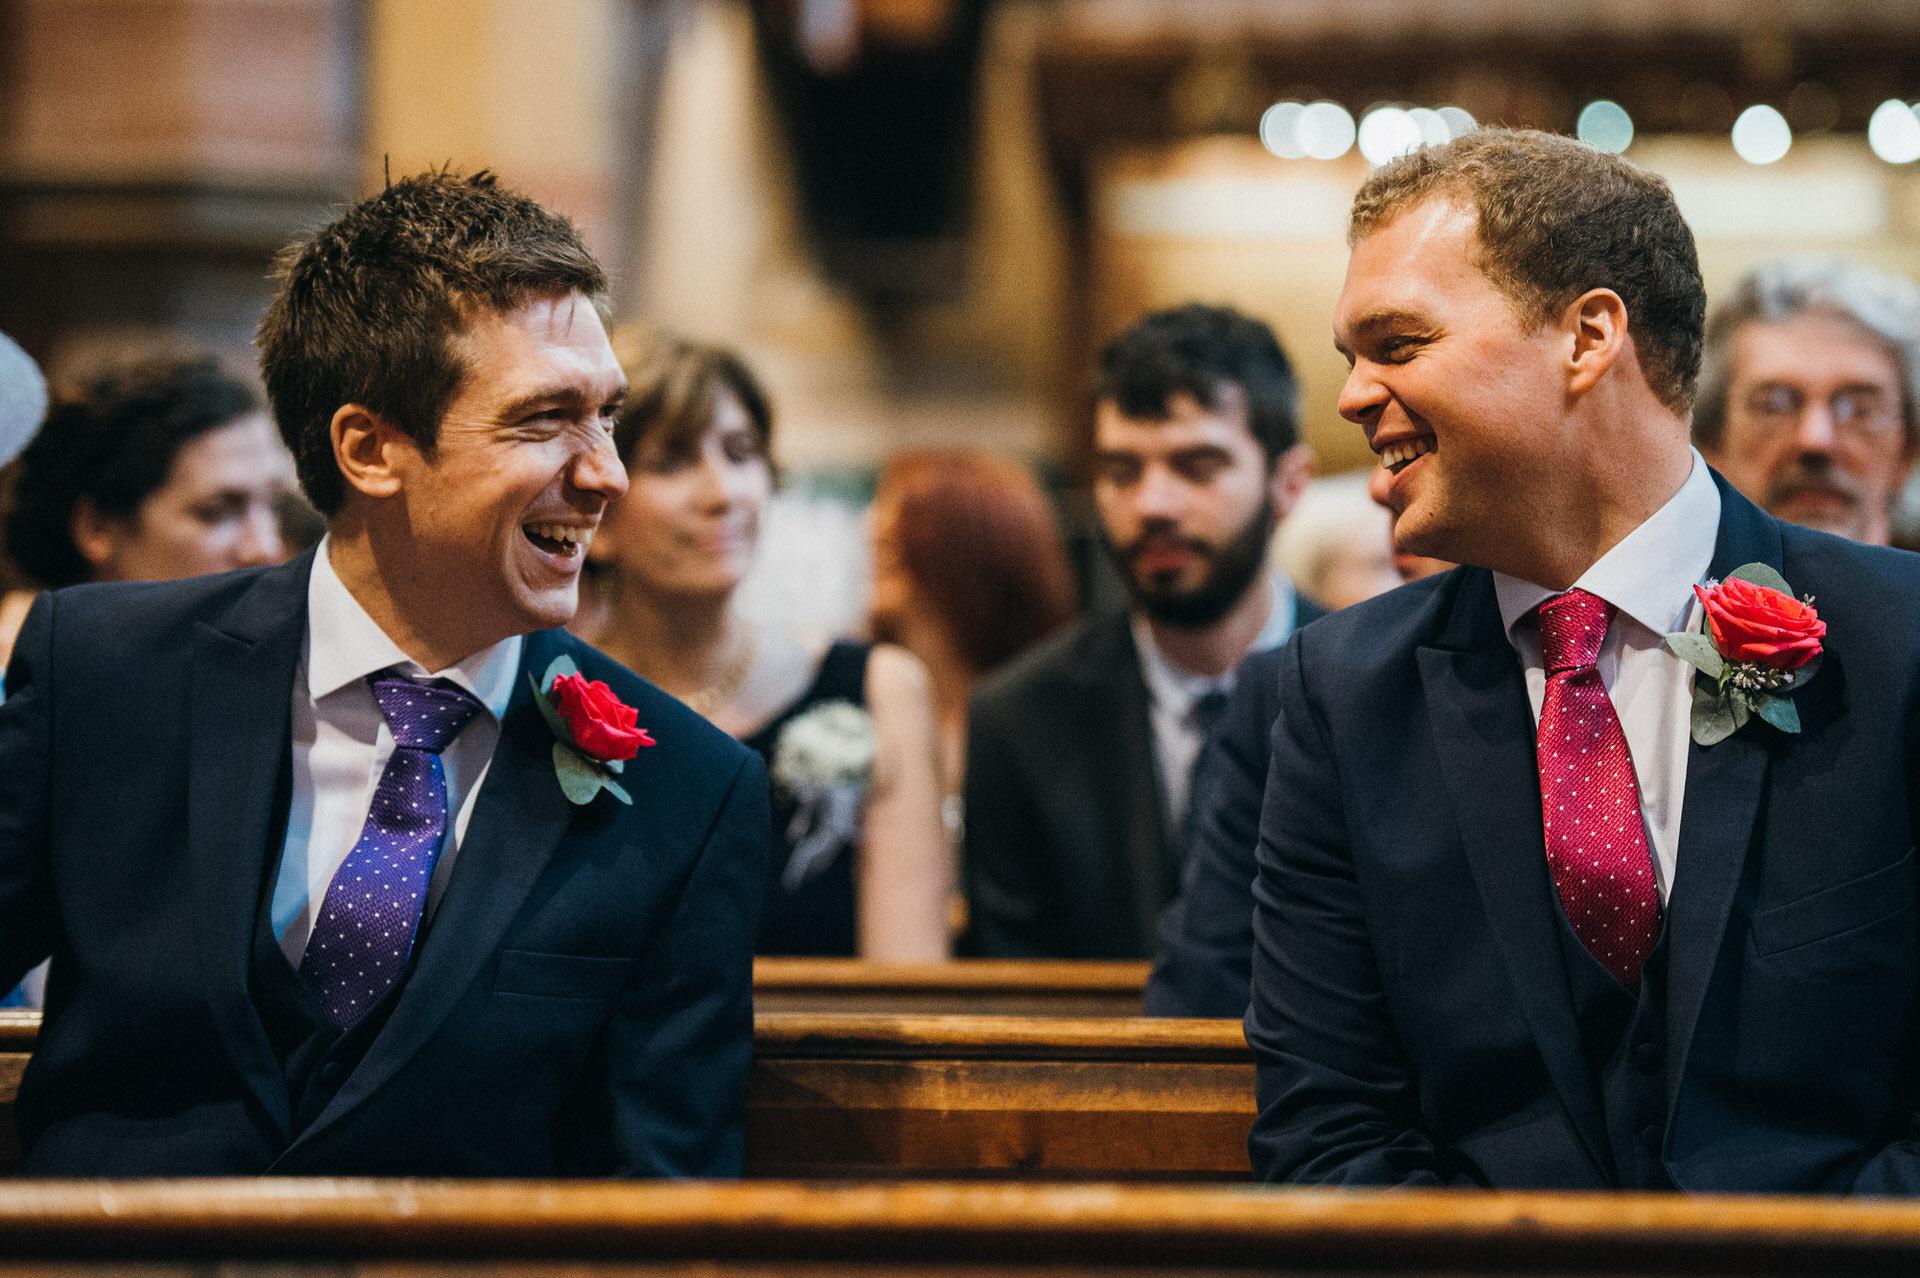 Penarth wedding photography siandan 018